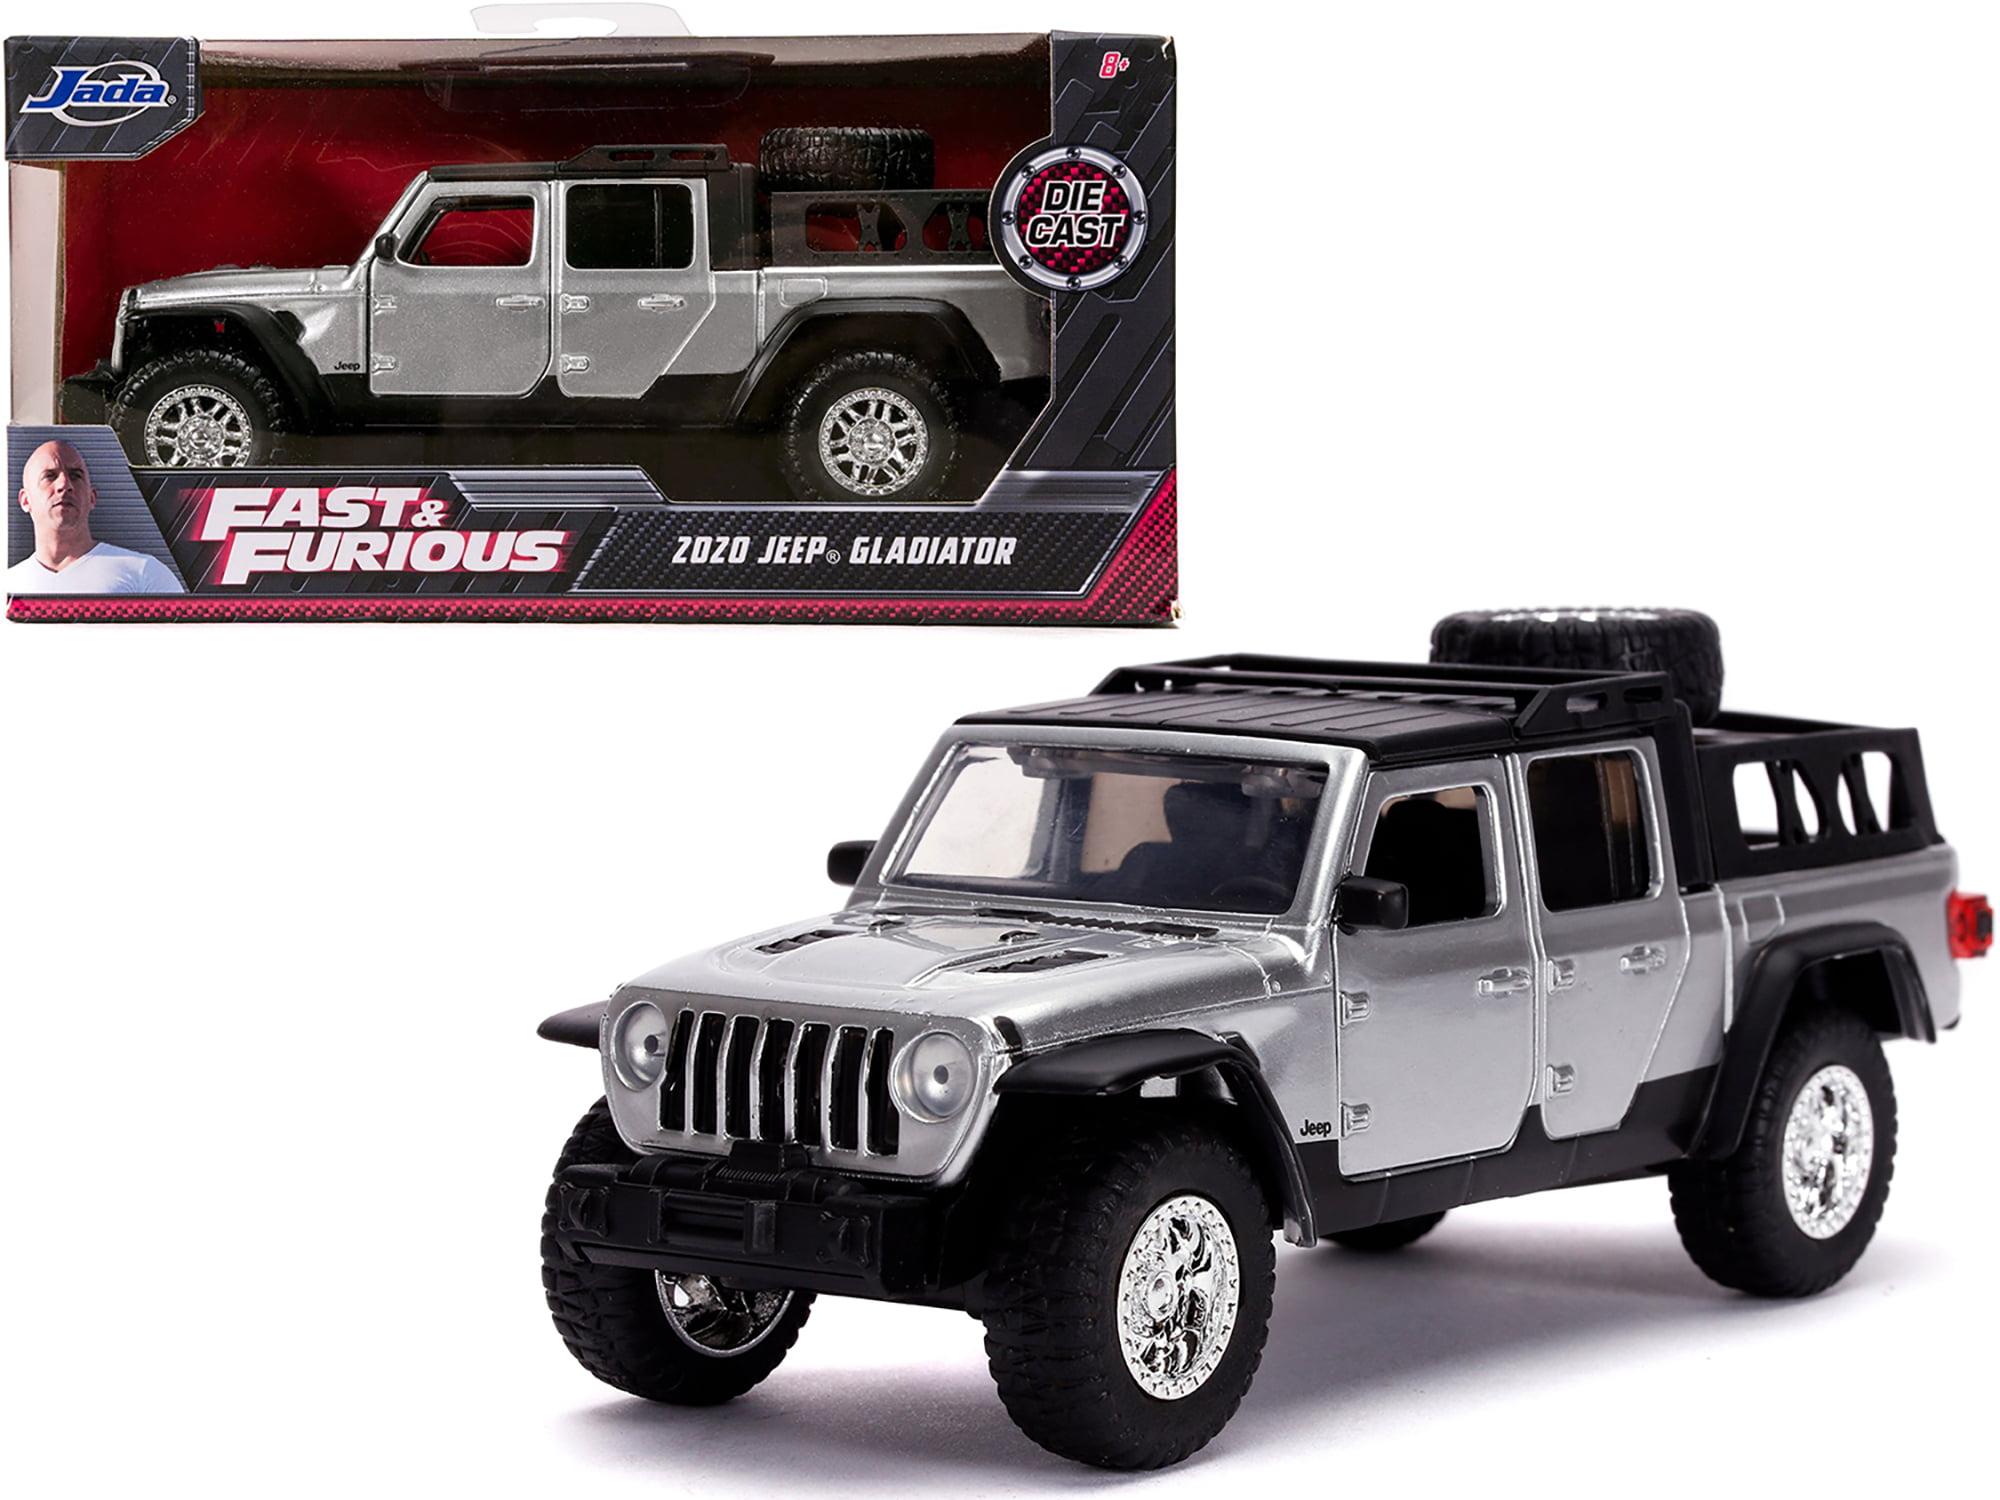 Jeep Wrangler Gladiator Pickup Truck 1:32 Die Cast Modellauto Spielzeug Schwarz